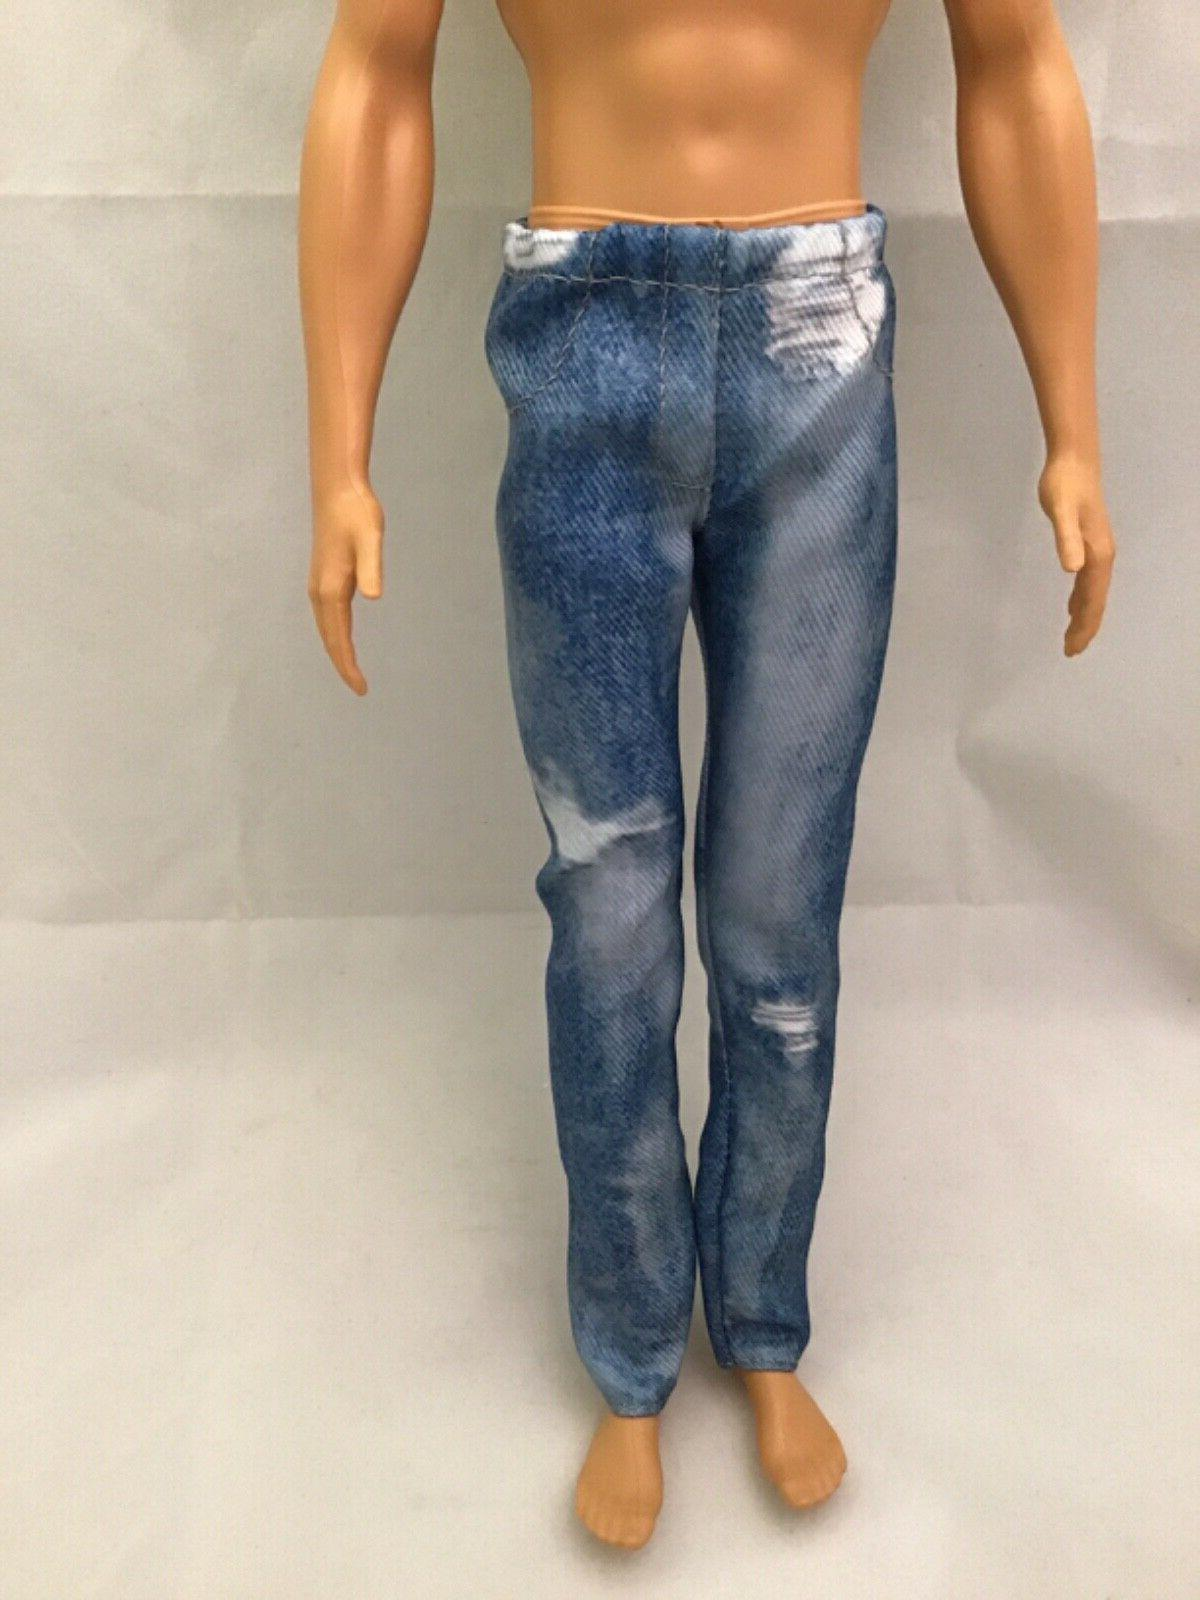 ken doll faux distressed blue jeans fashion